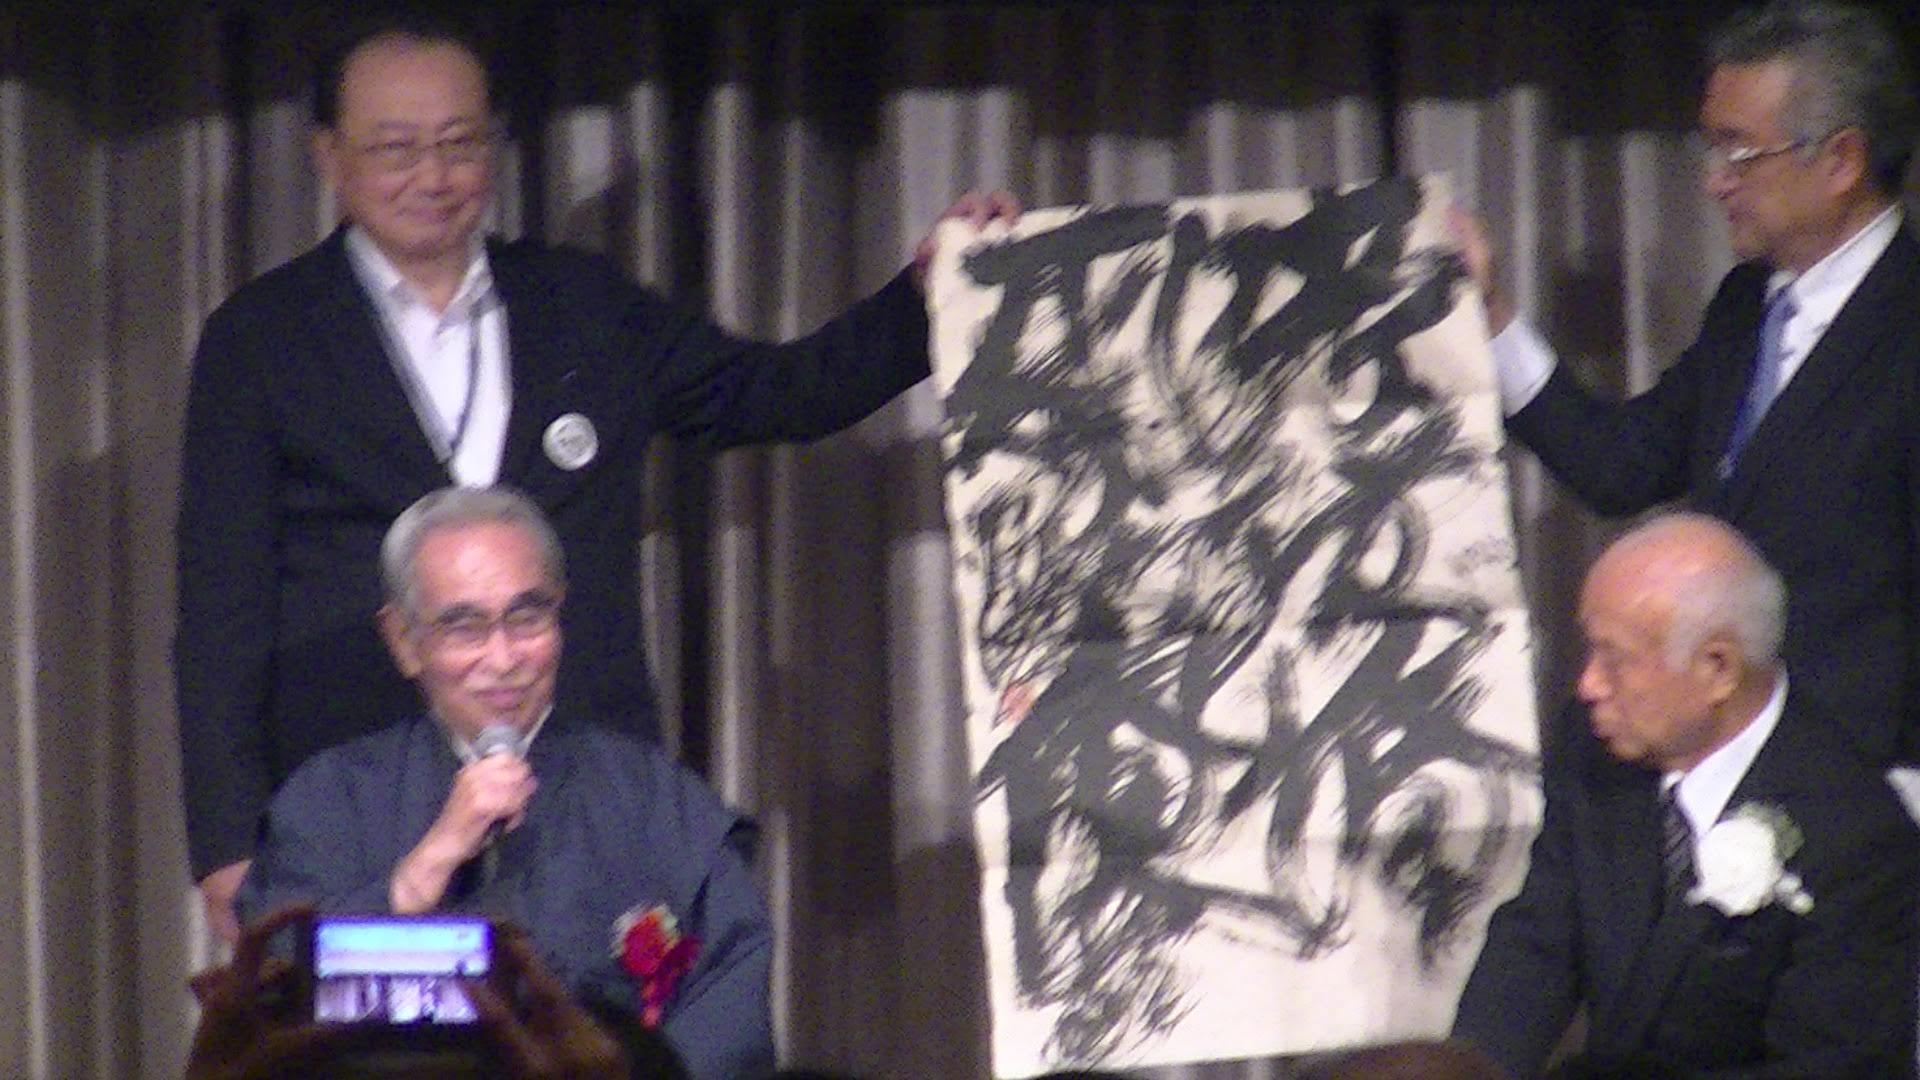 PIC 1807 1 - 思風会全国大会in広島